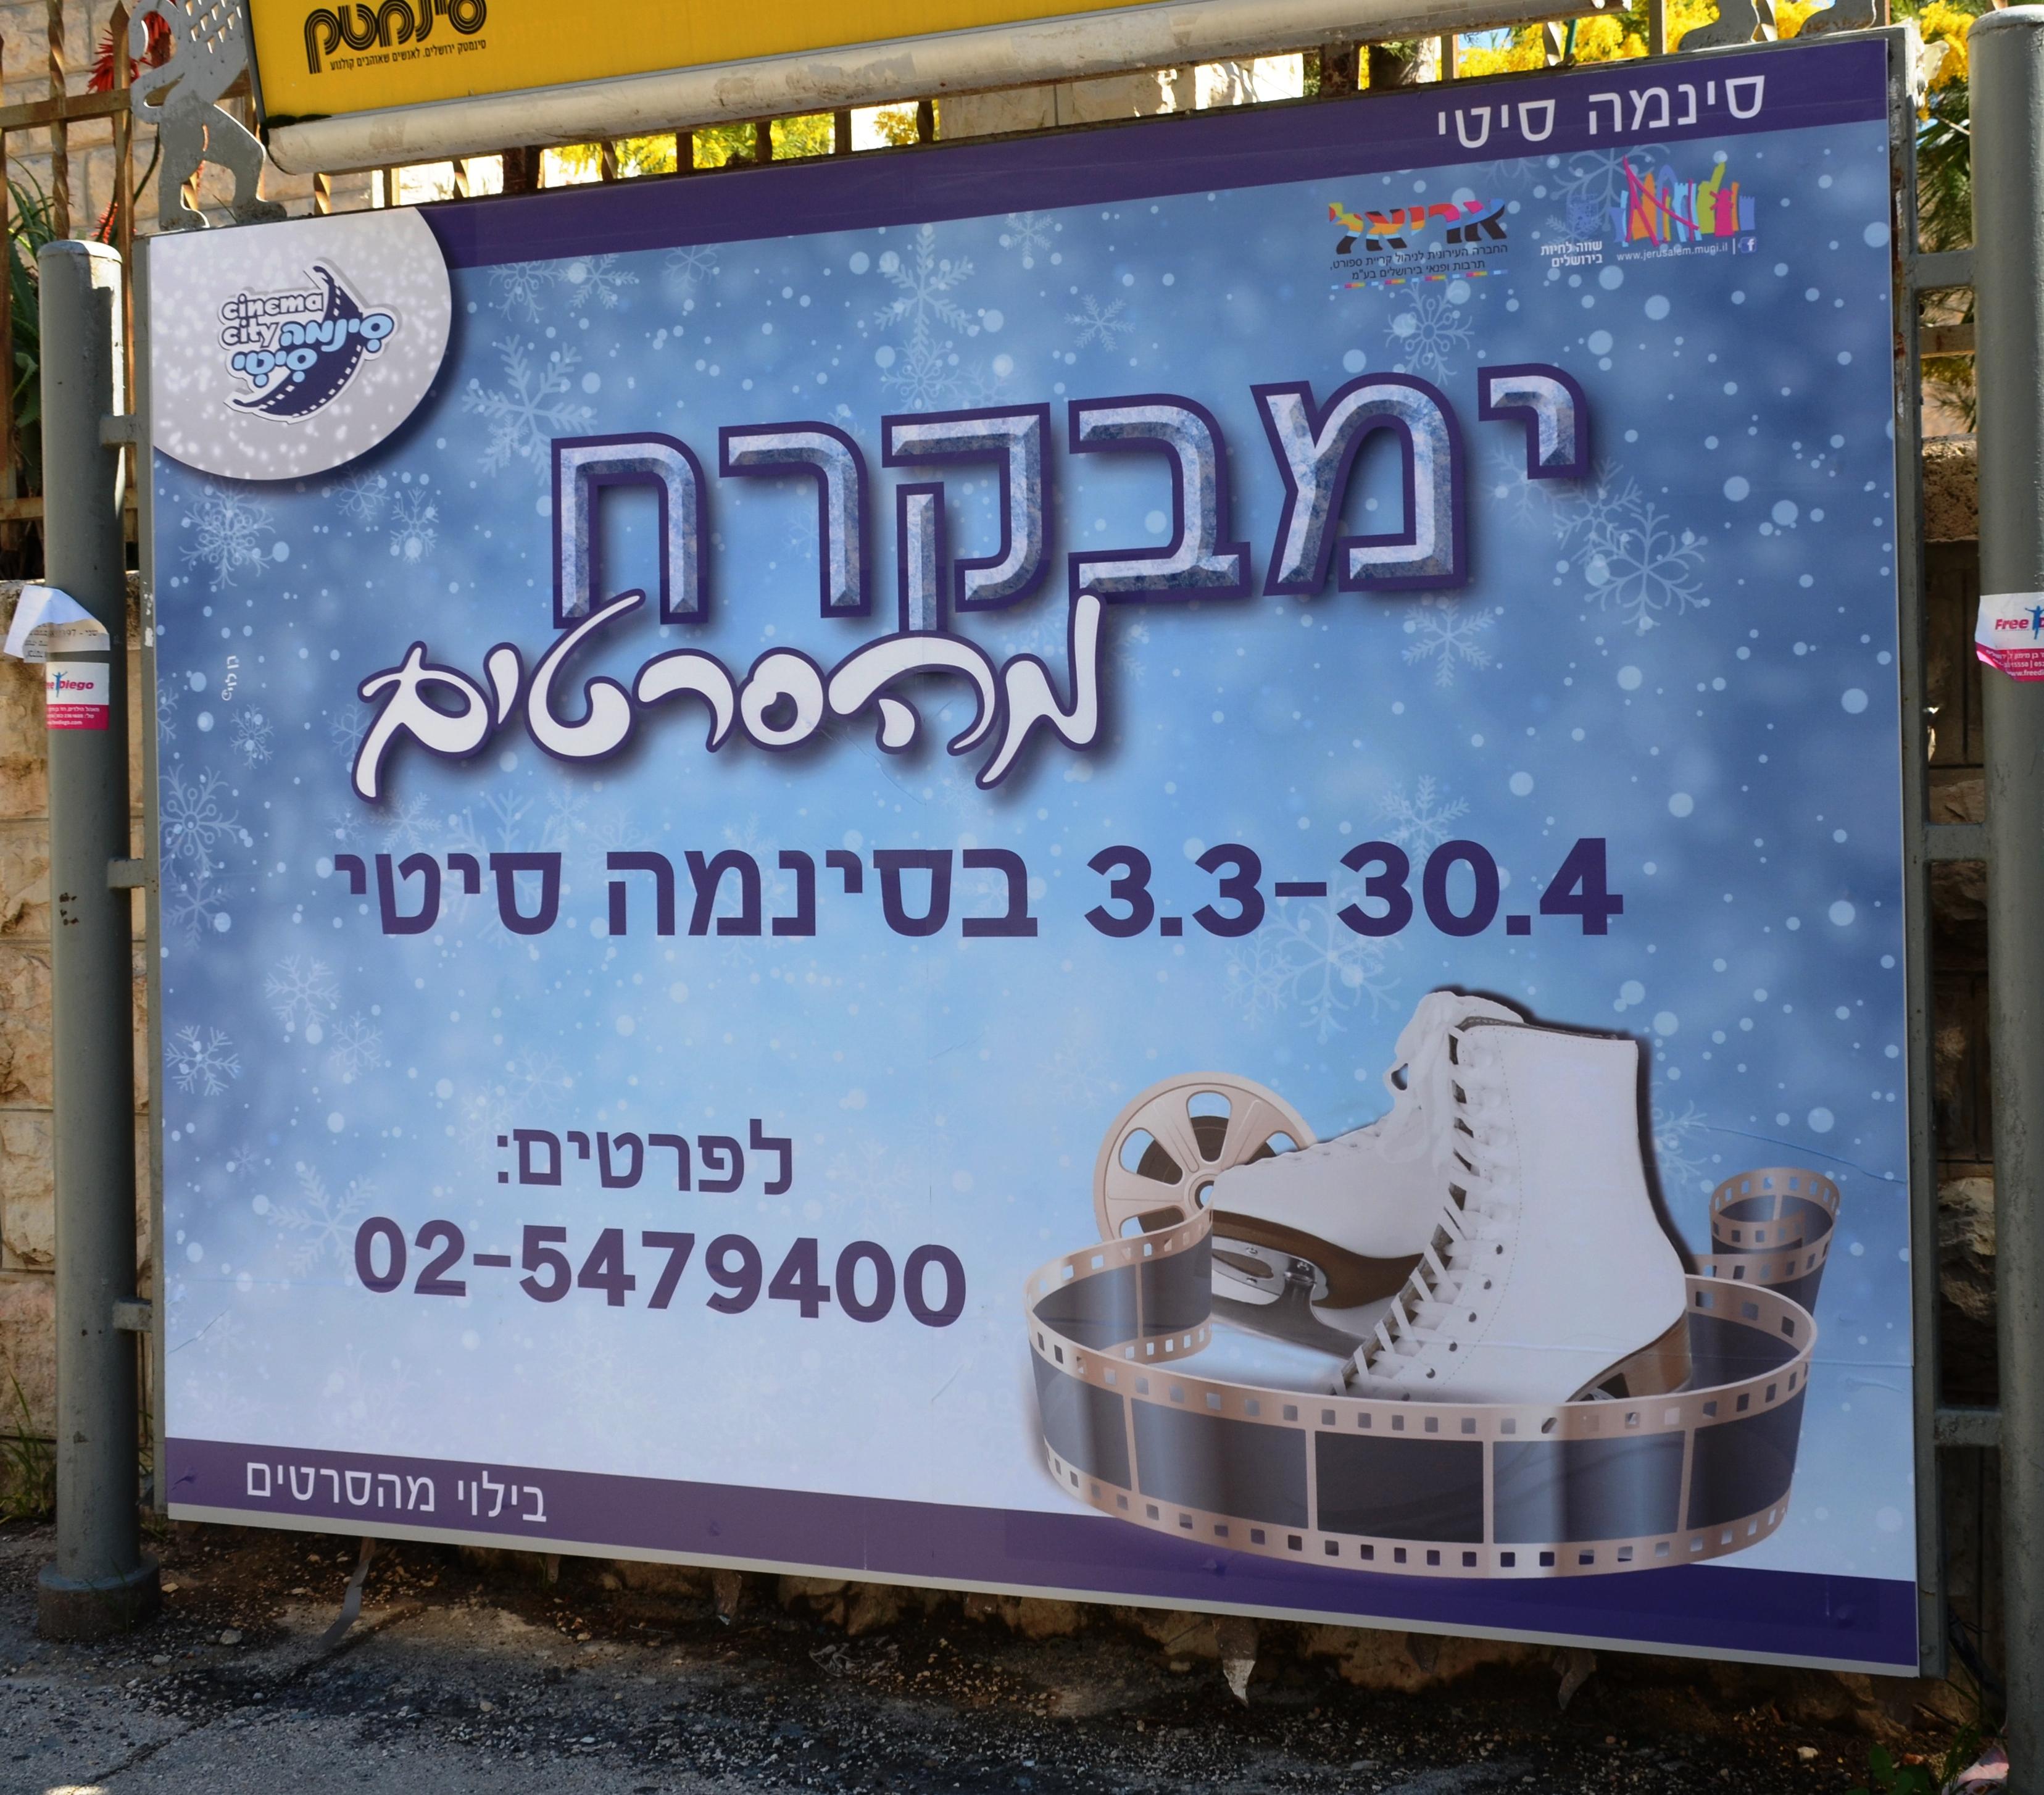 Ice skating at Cinema City Jerusalem